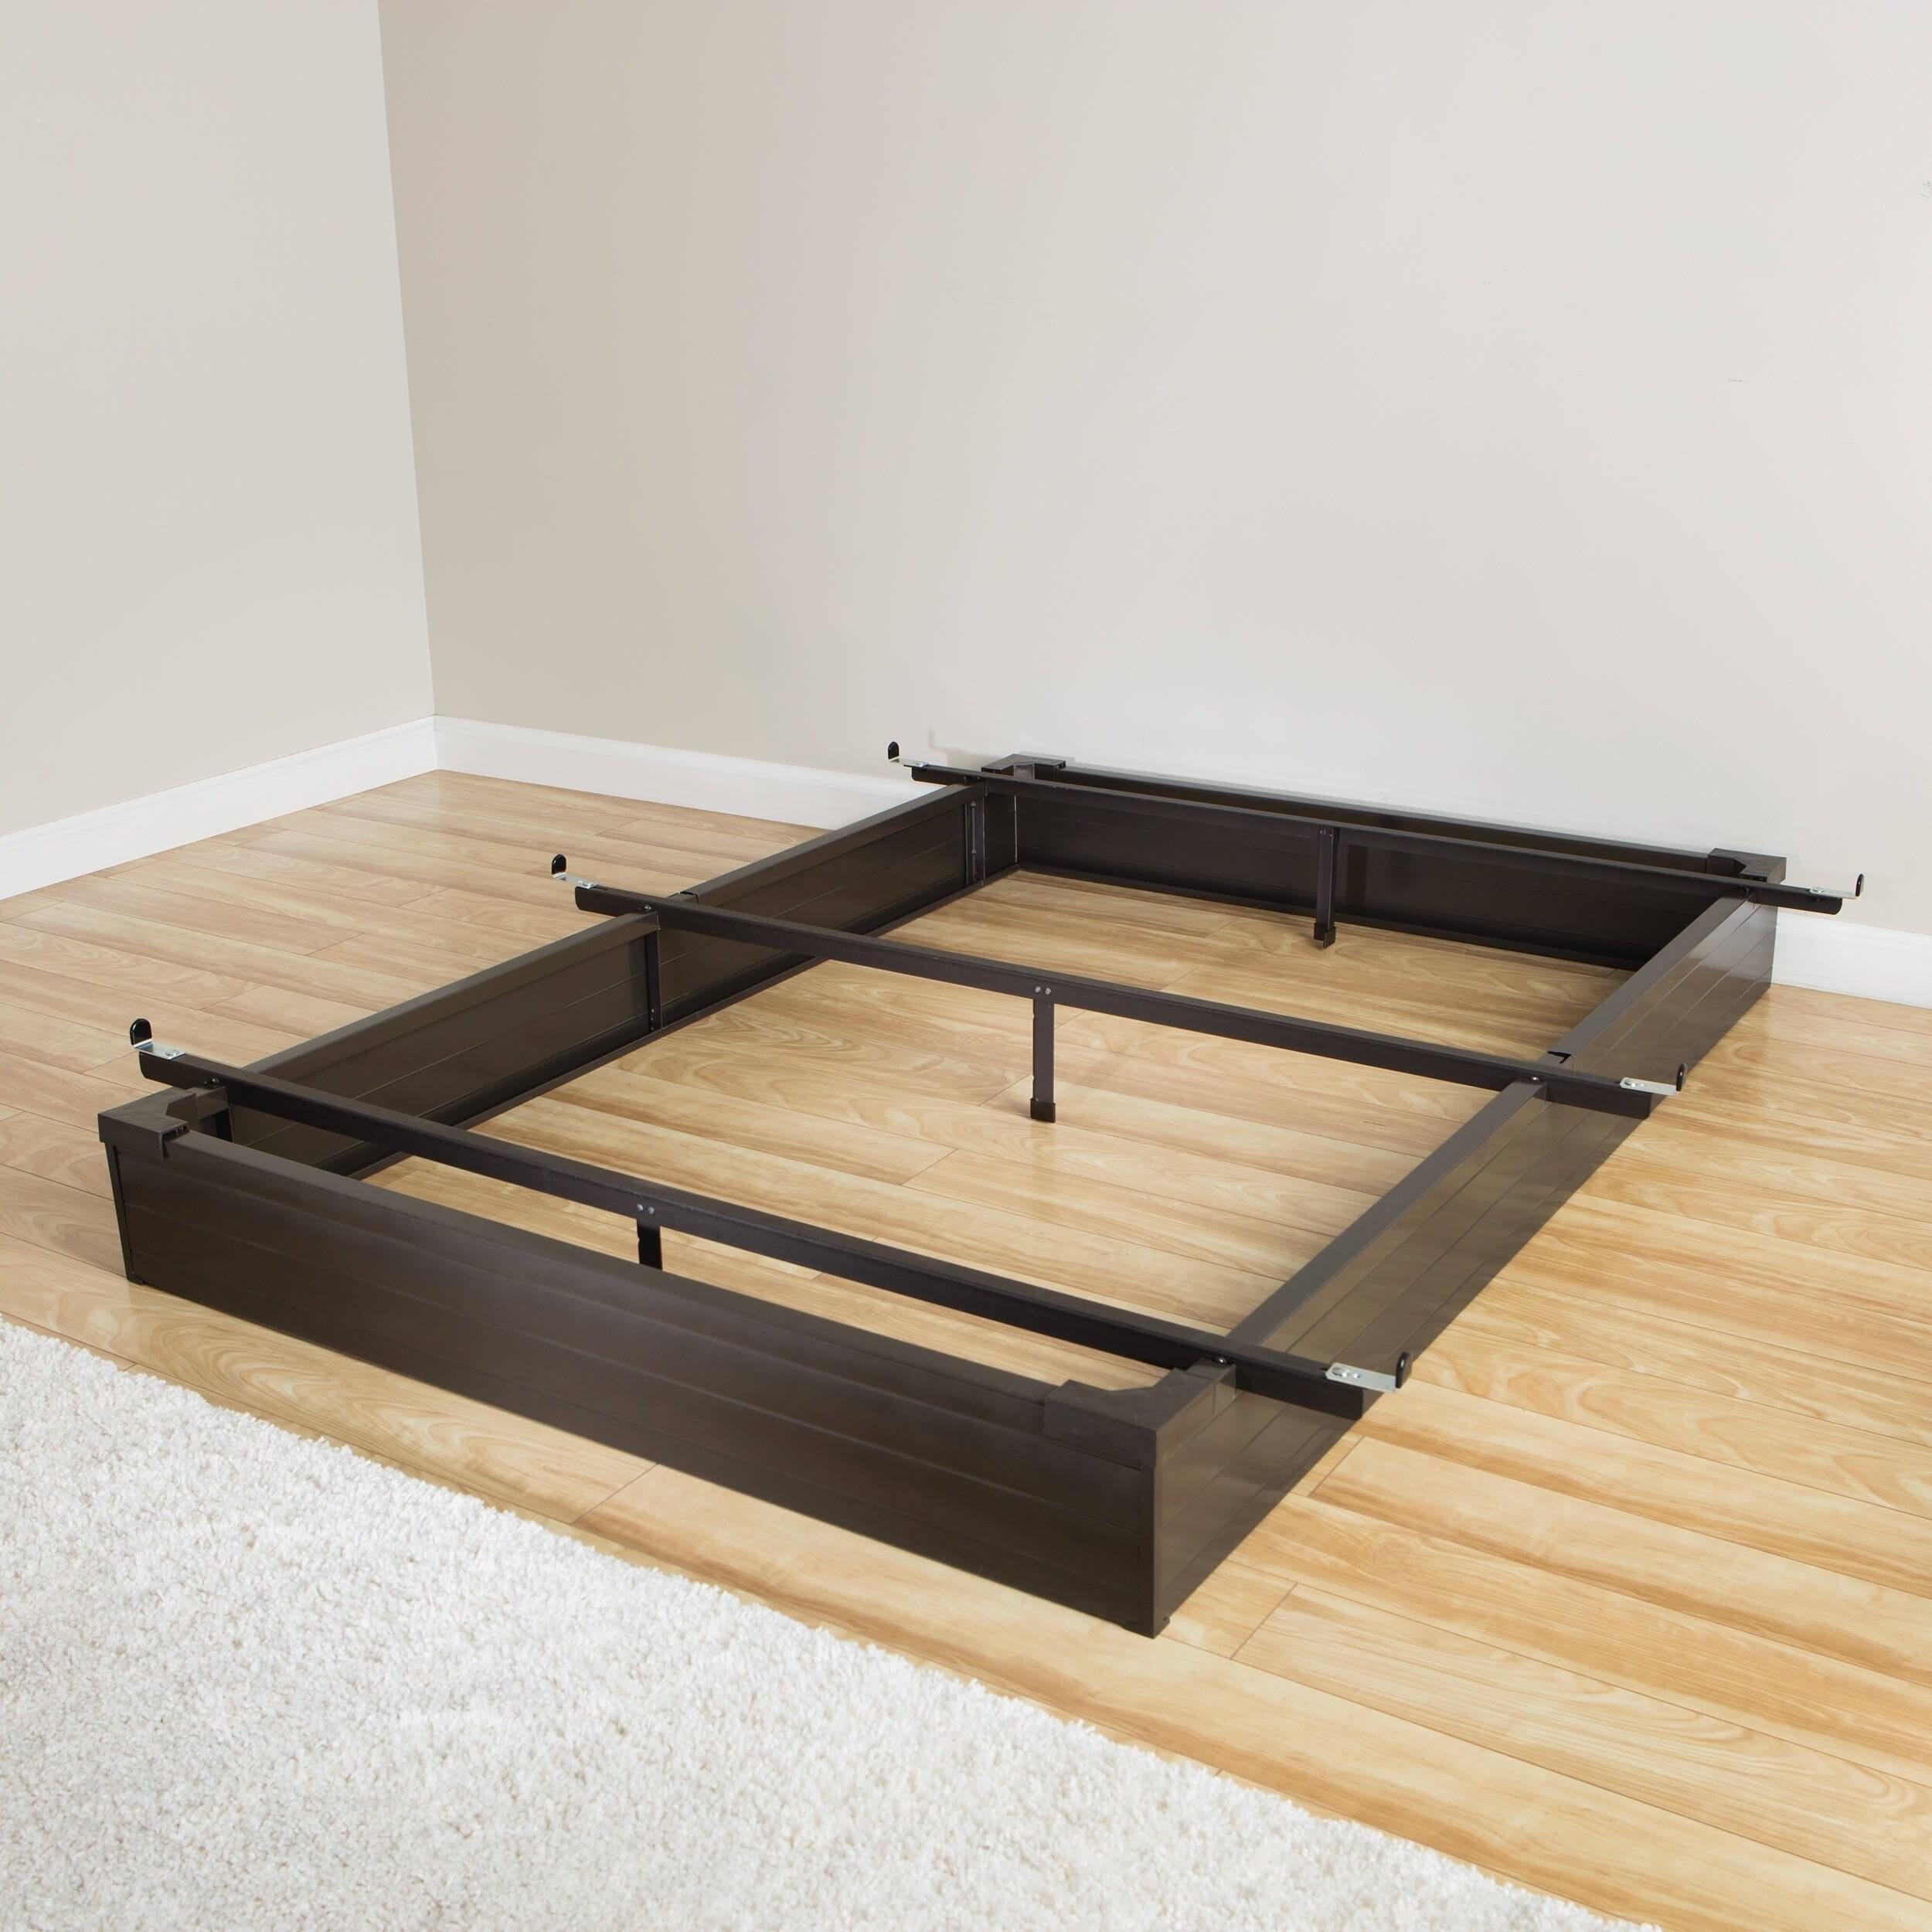 CoverKing Mantua Java Brown Full-Size Metal Bed Base (Ful...